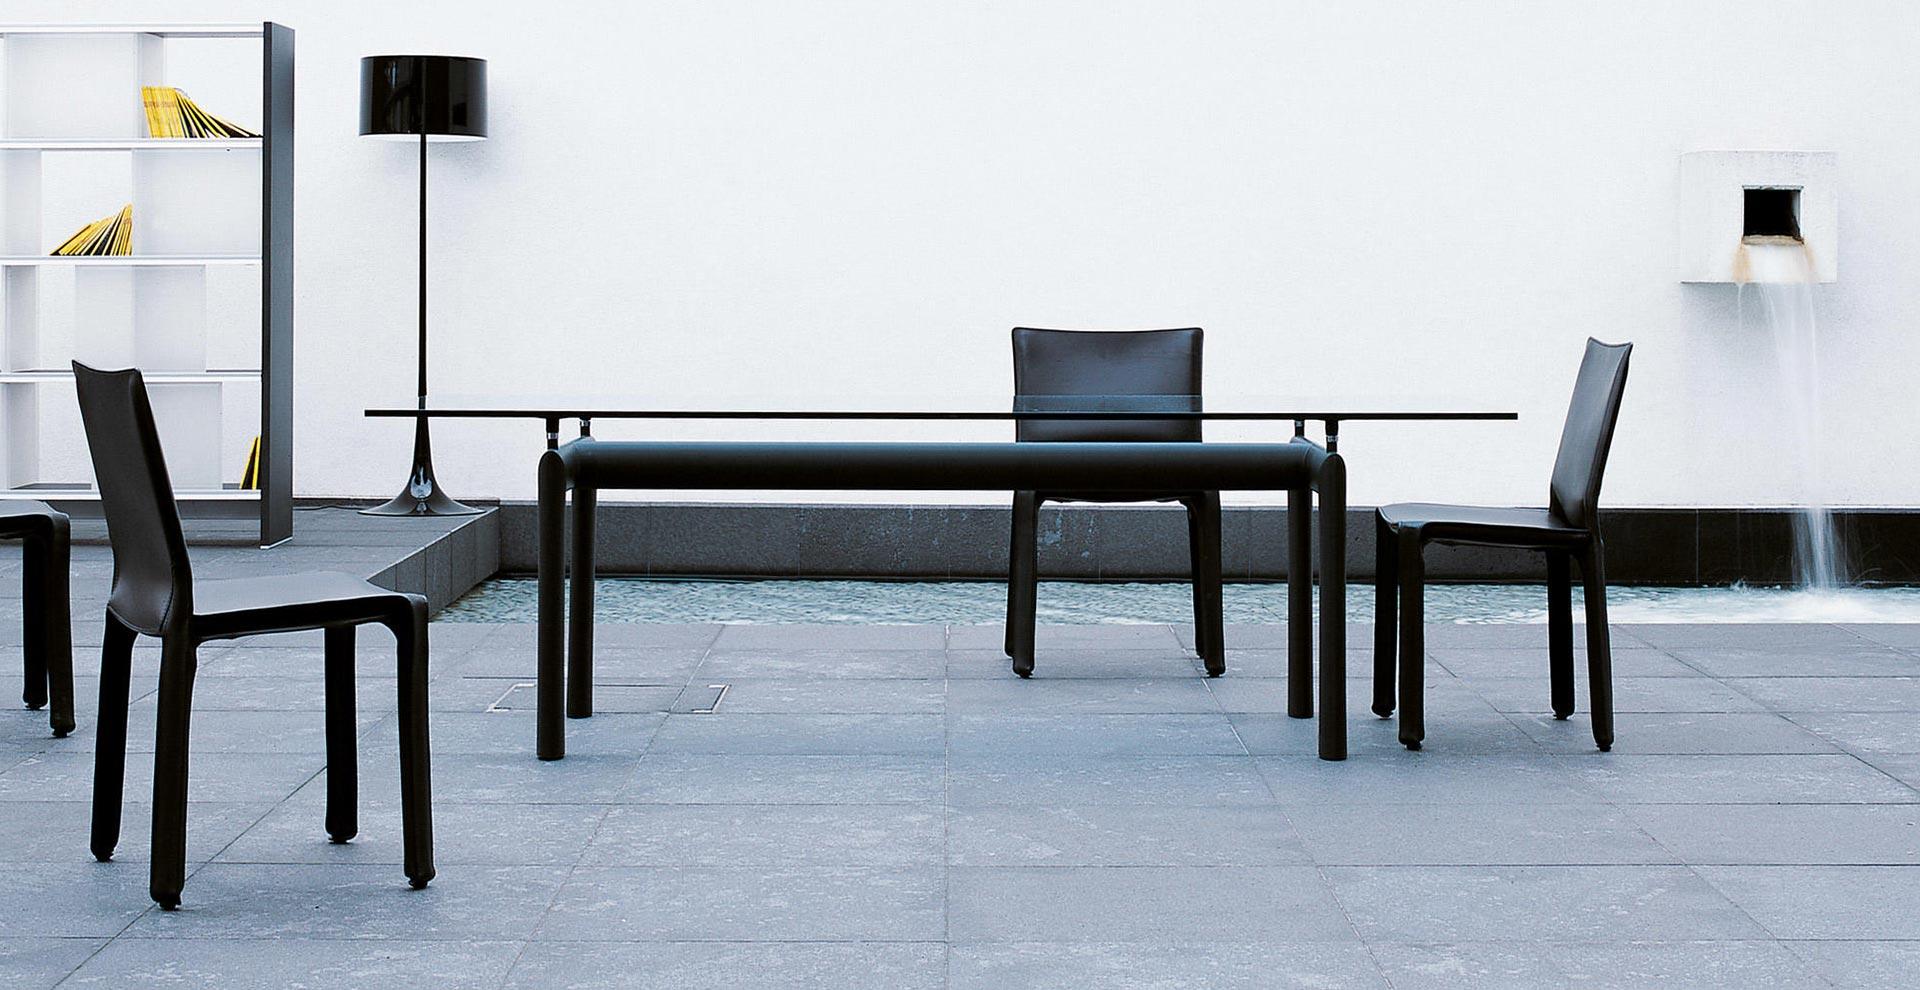 Lc6 cassina table lc6 cassina desk lc6 cassina for Cassina tavoli